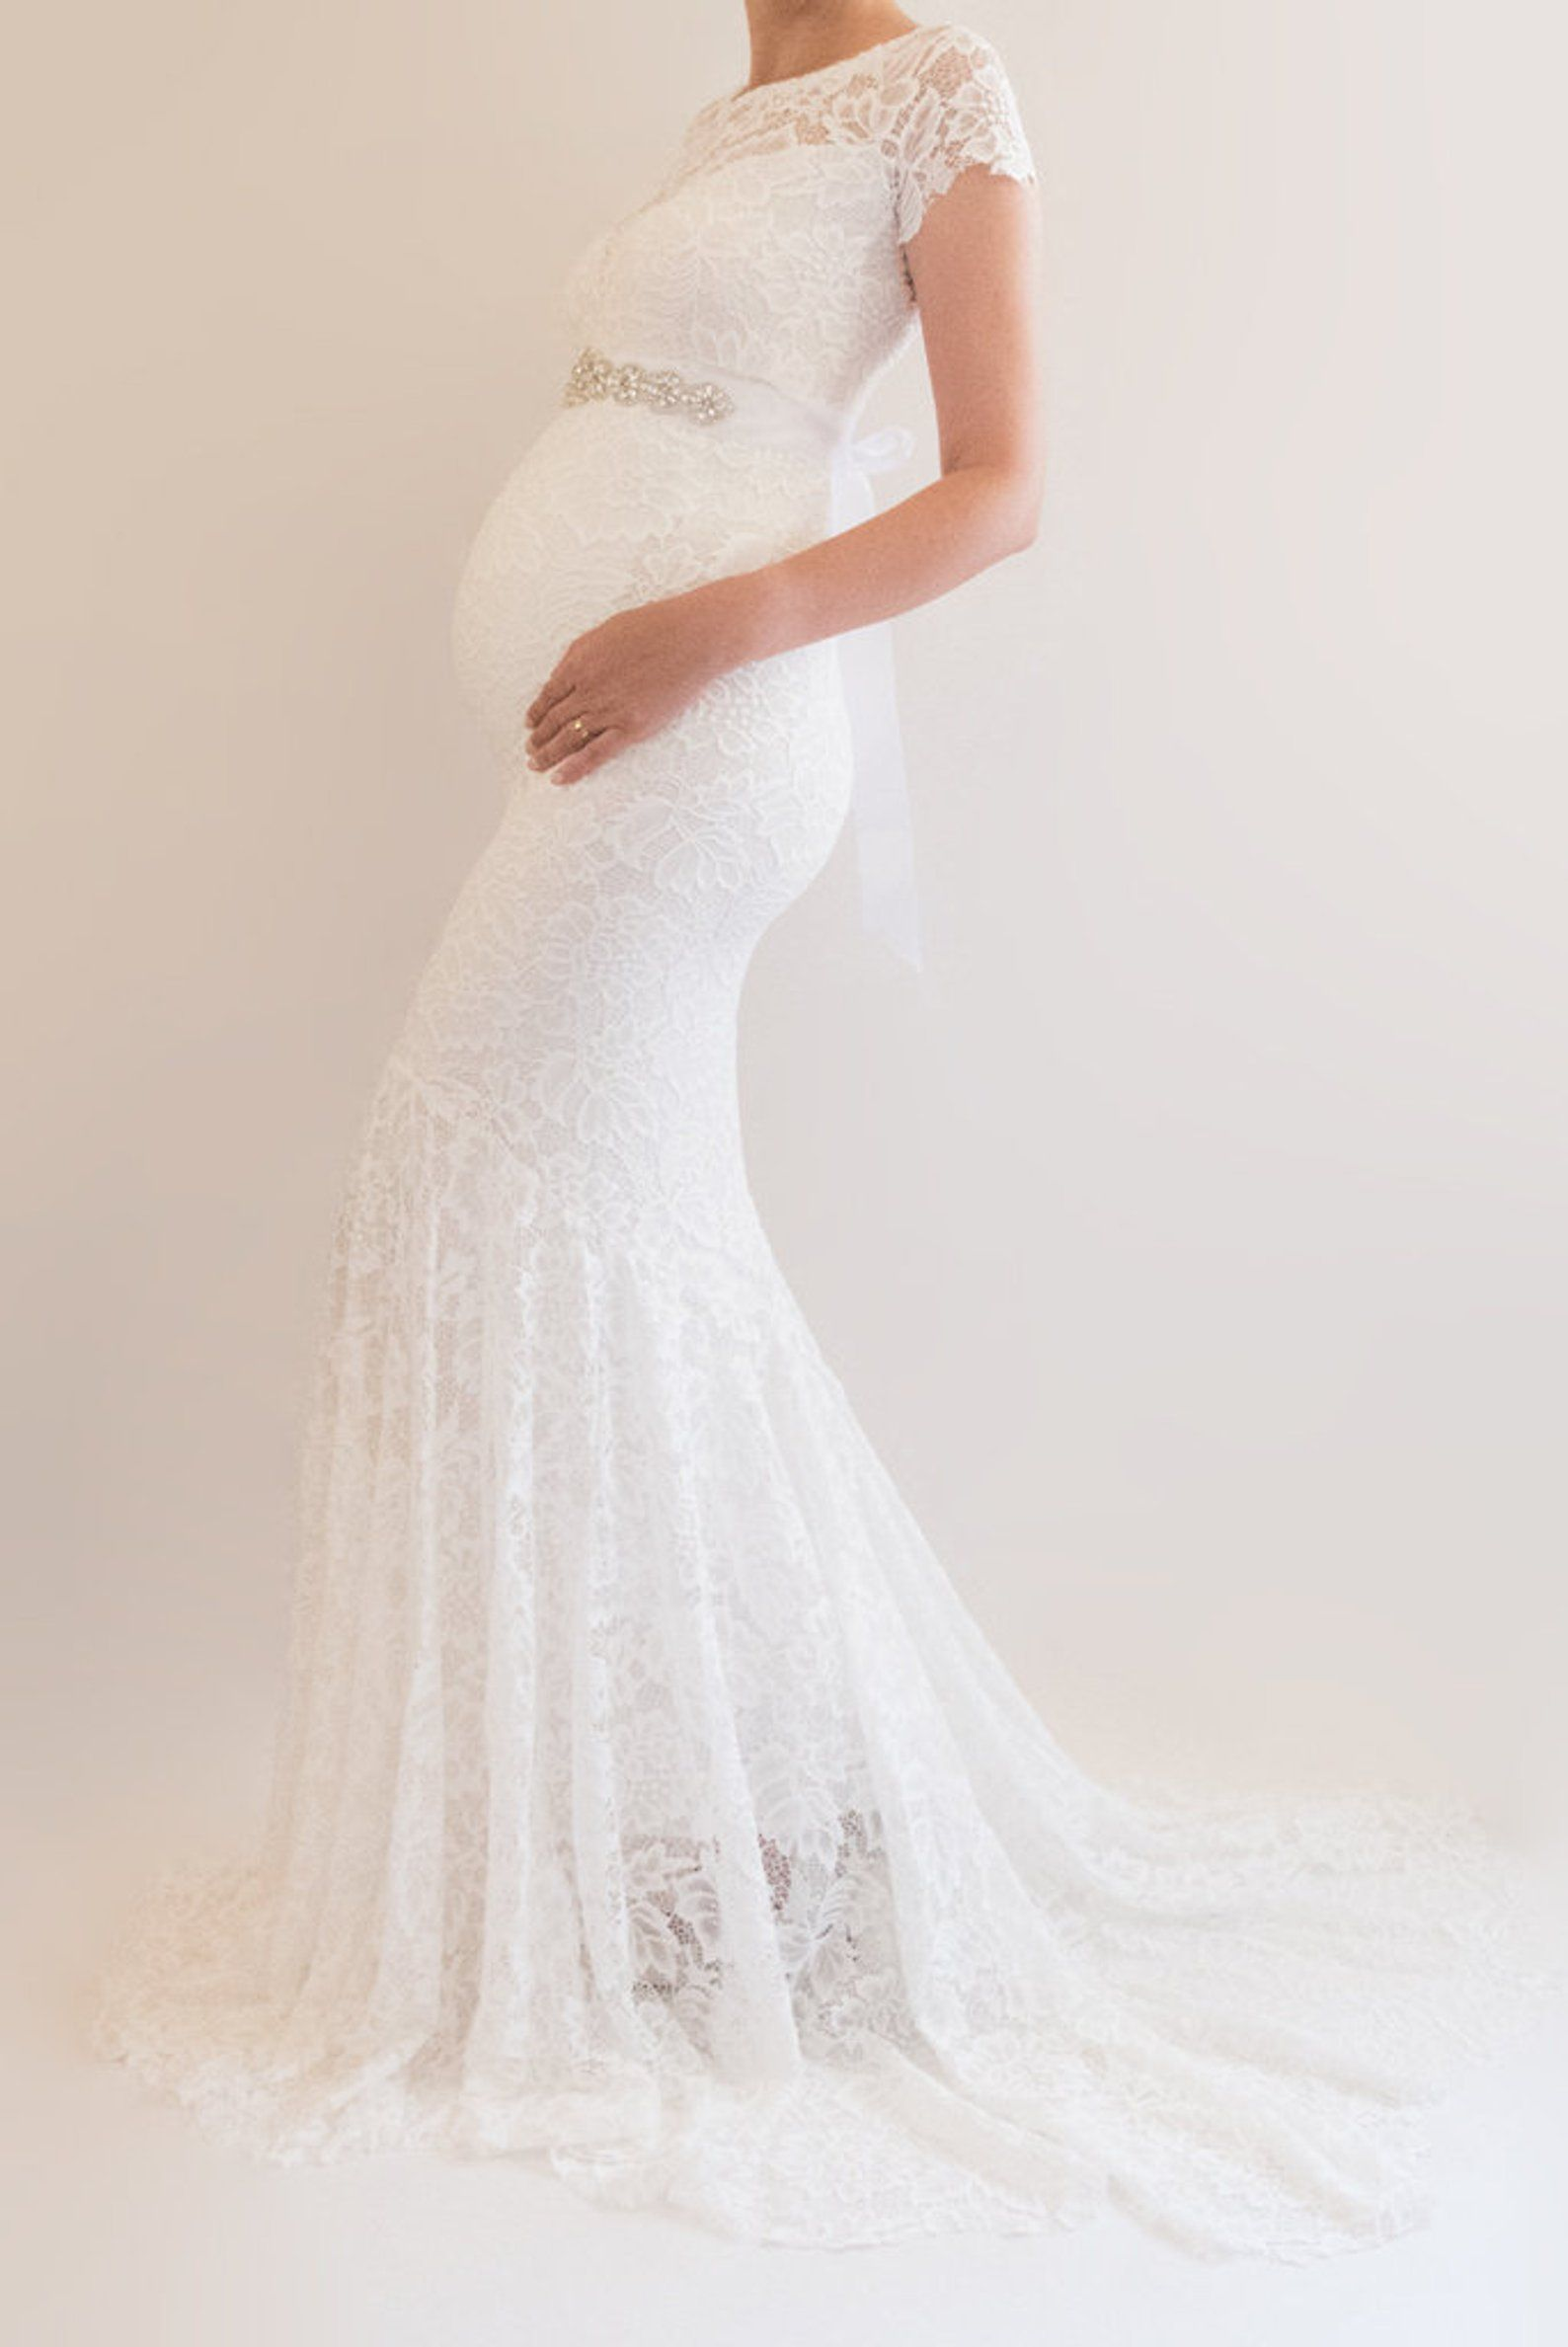 Briar Lace Maternity Wedding Dress Boho Bridal Gown Modest Etsy Modest Bridal Gowns Maternity Bridal Gowns Lace Maternity Wedding Dresses [ jpg ]